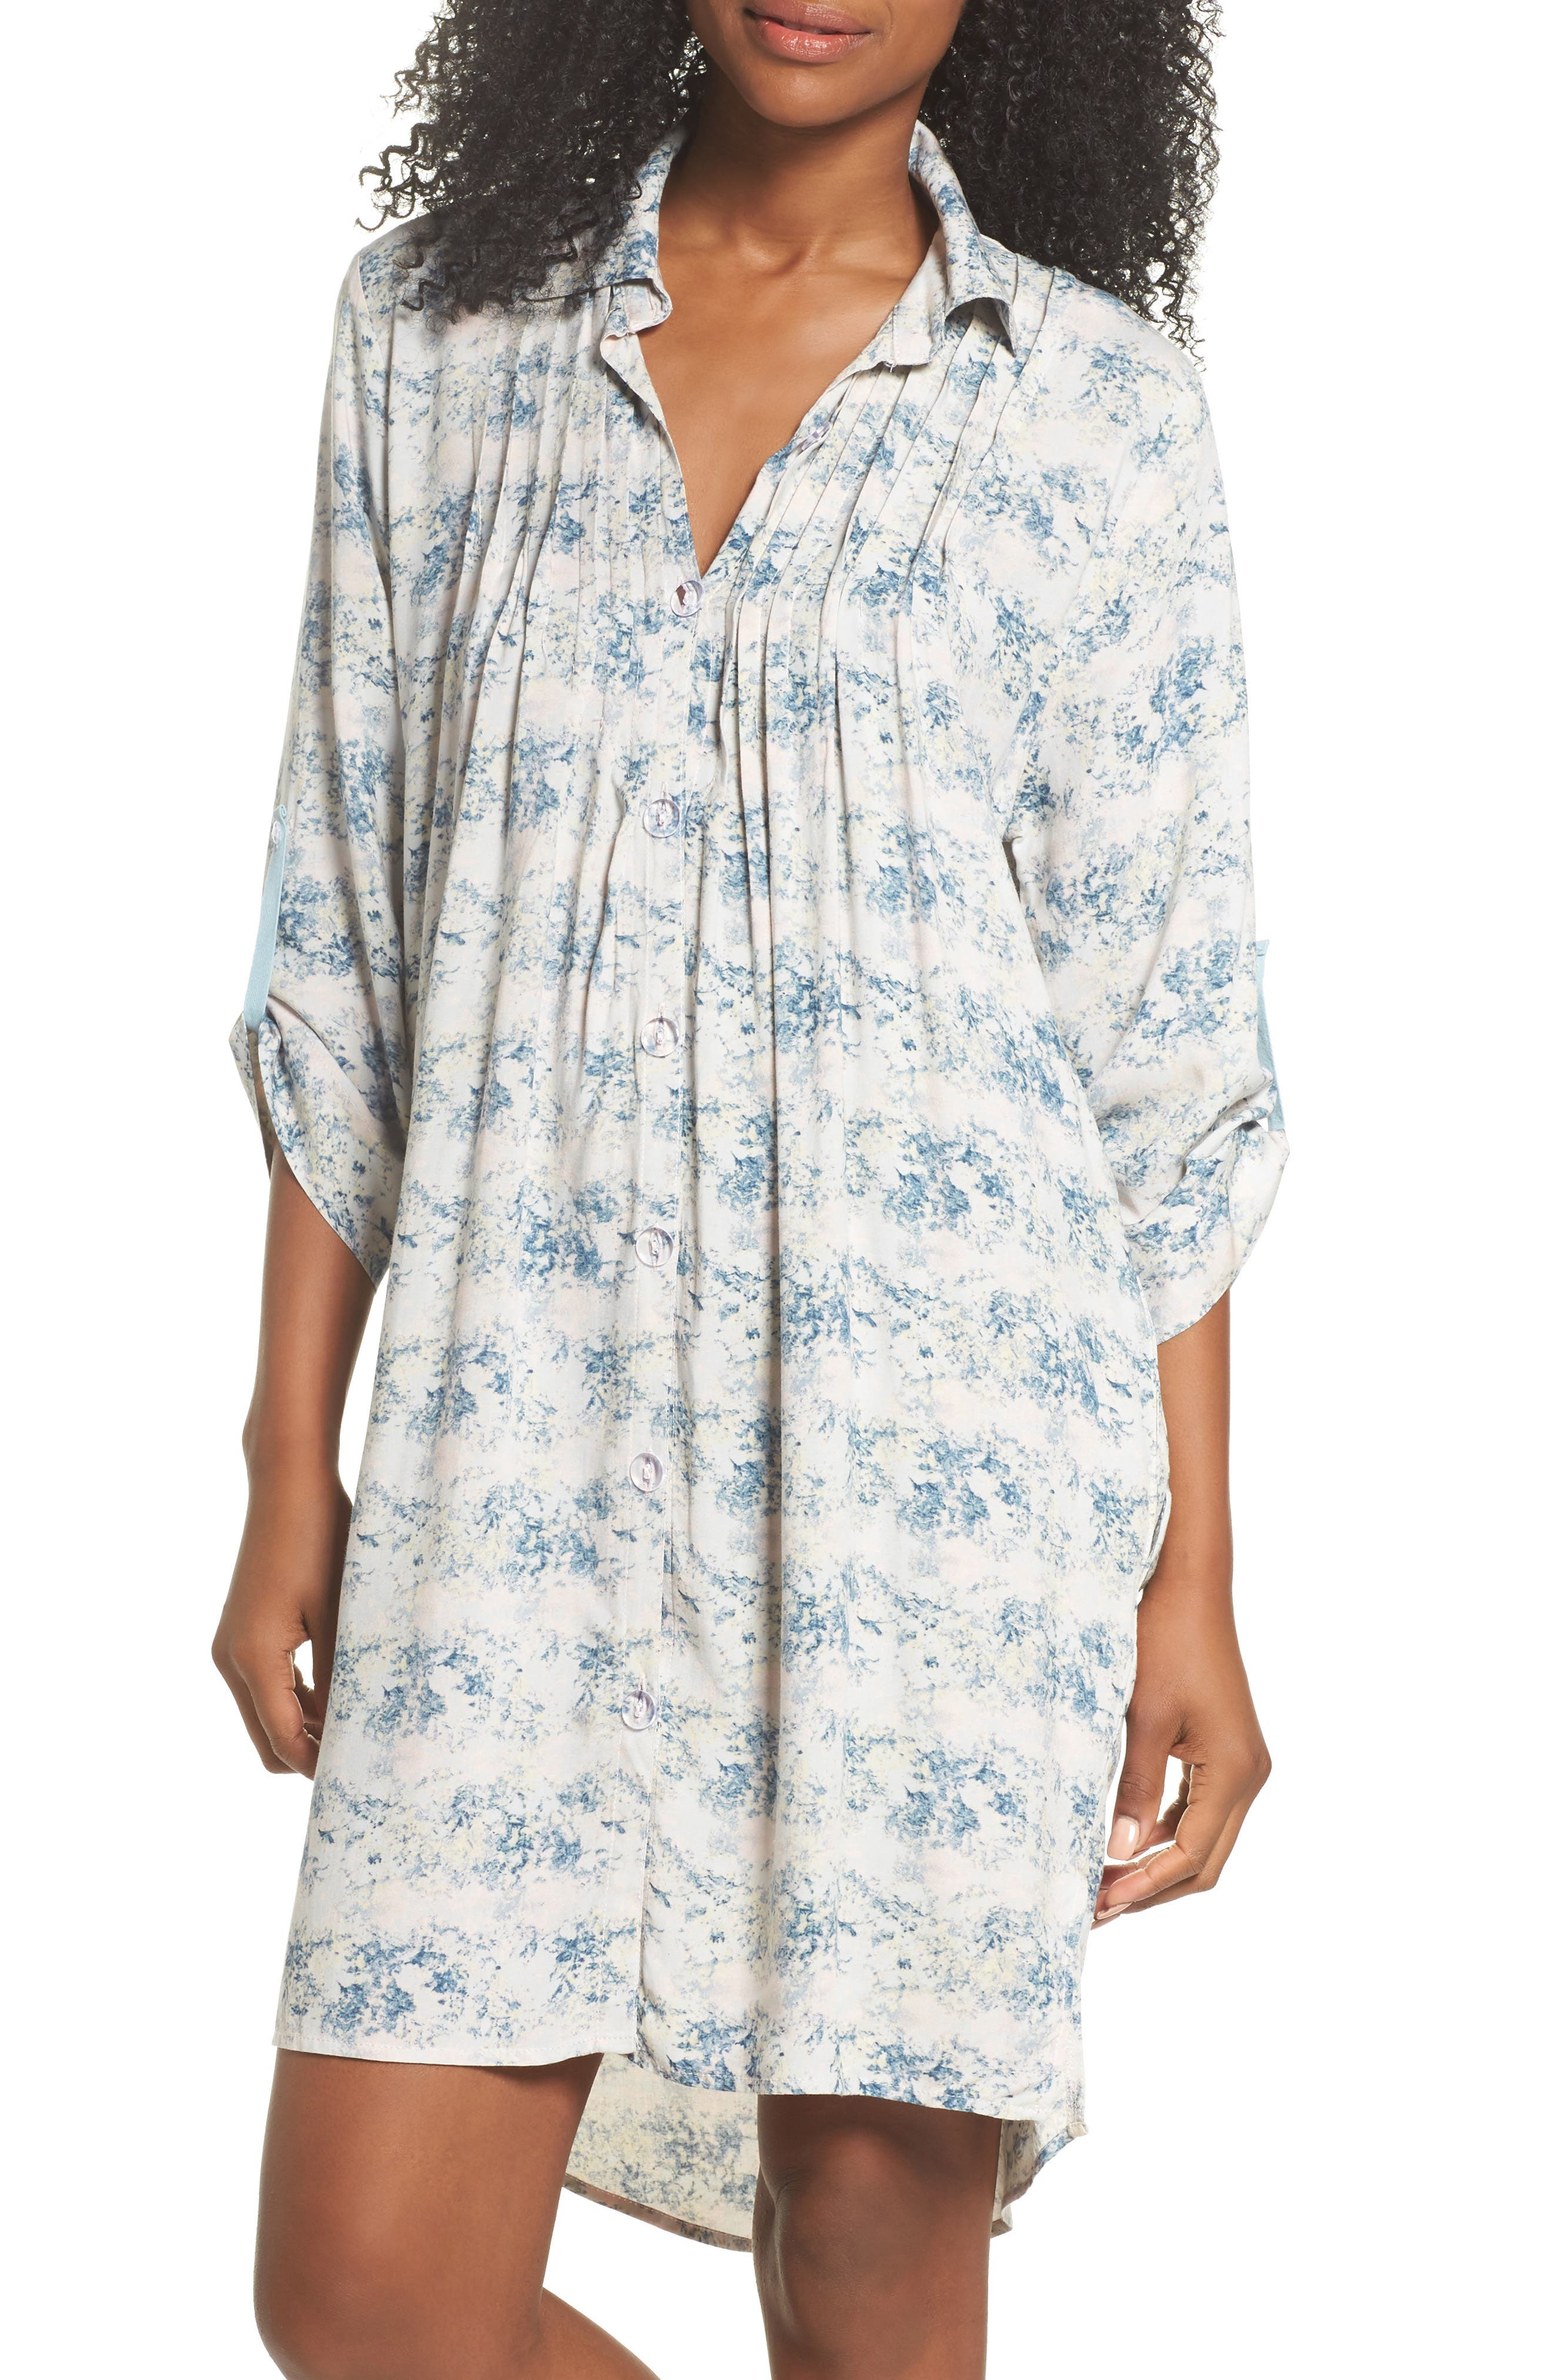 PAPINELLE,                             Floral Print Sleep Shirt,                             Main thumbnail 1, color,                             403